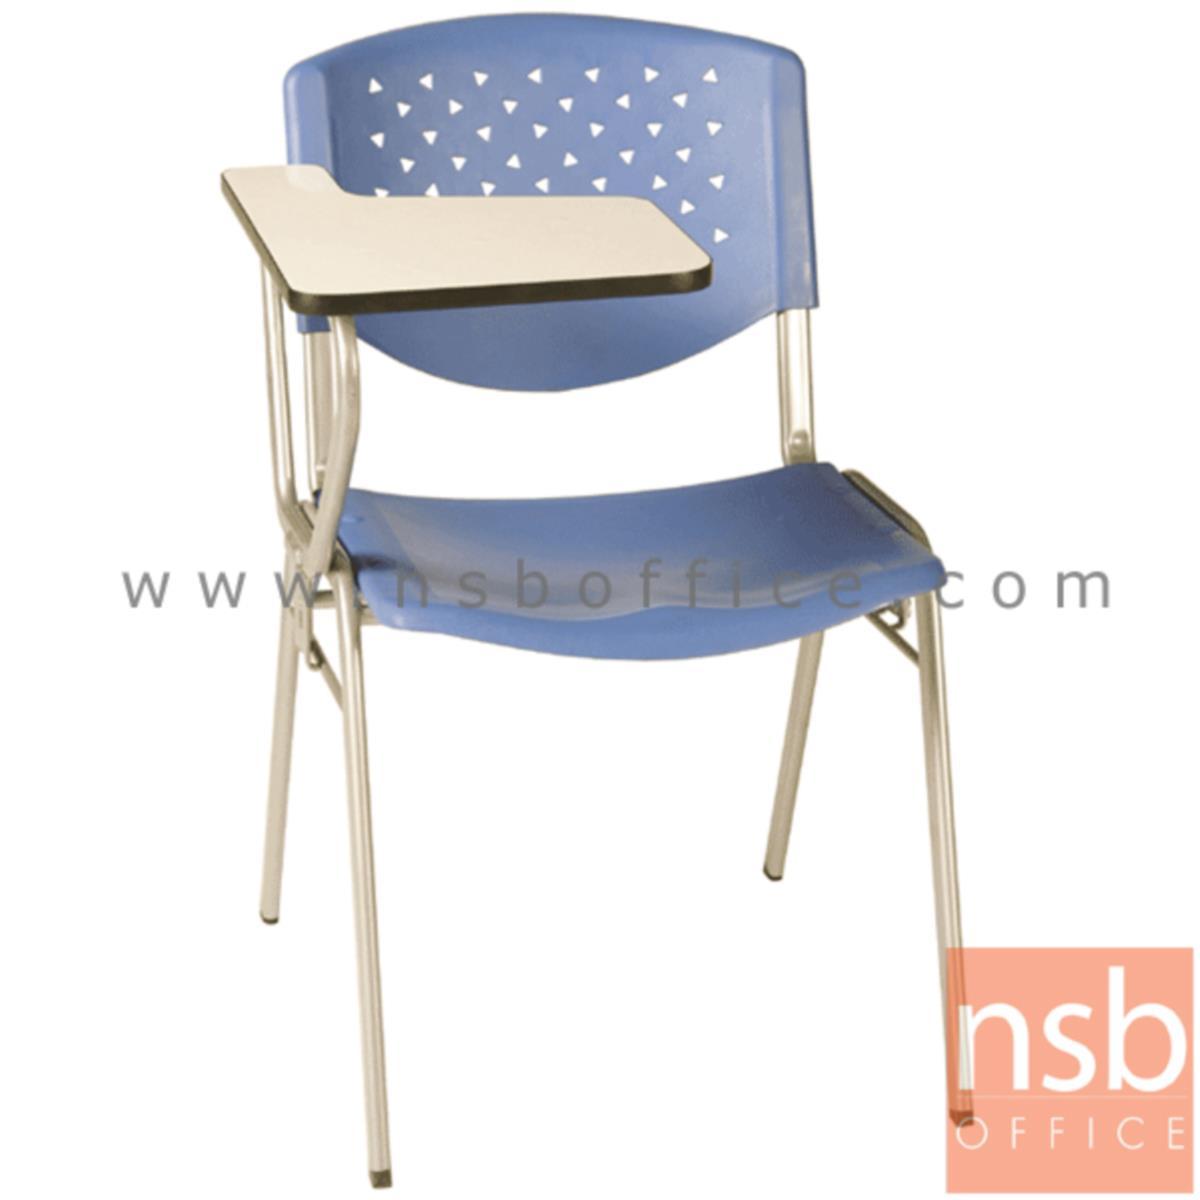 B07A050:เก้าอี้เลคเชอร์เฟรมโพลี่ รุ่น C436-926 ขาเหล็ก